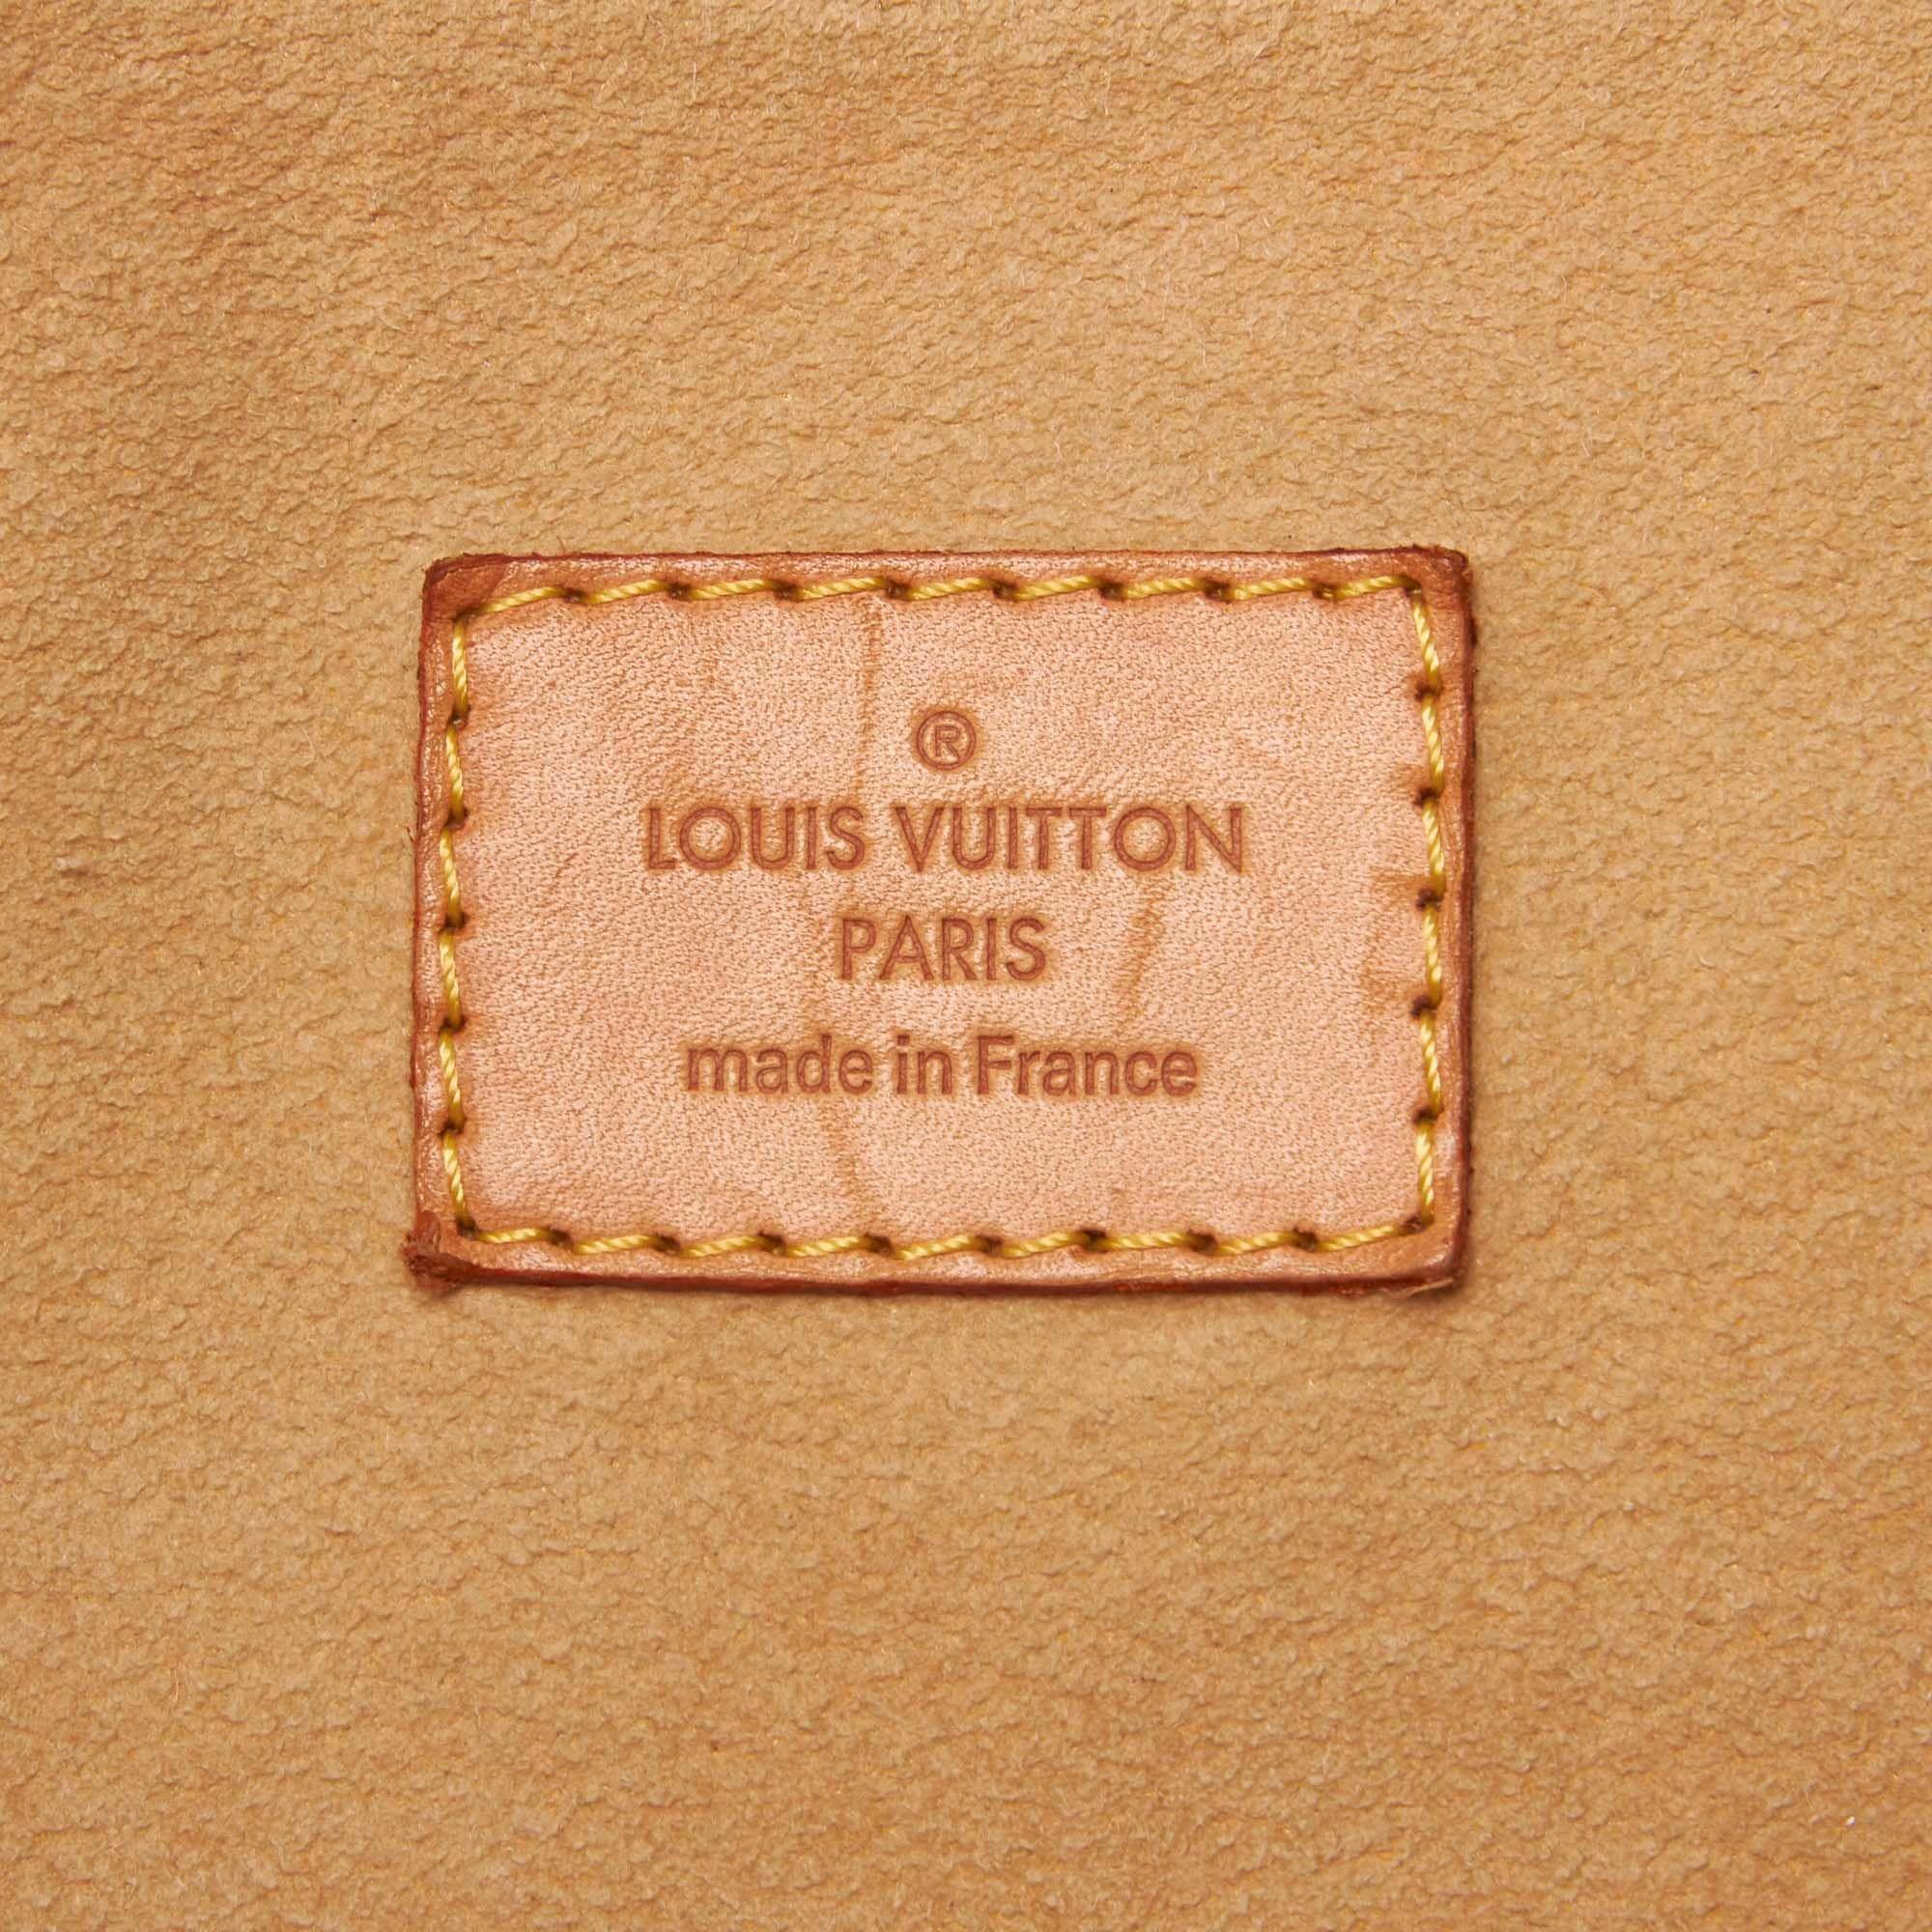 Vintage Louis Vuitton Damier Azur Evora MM White